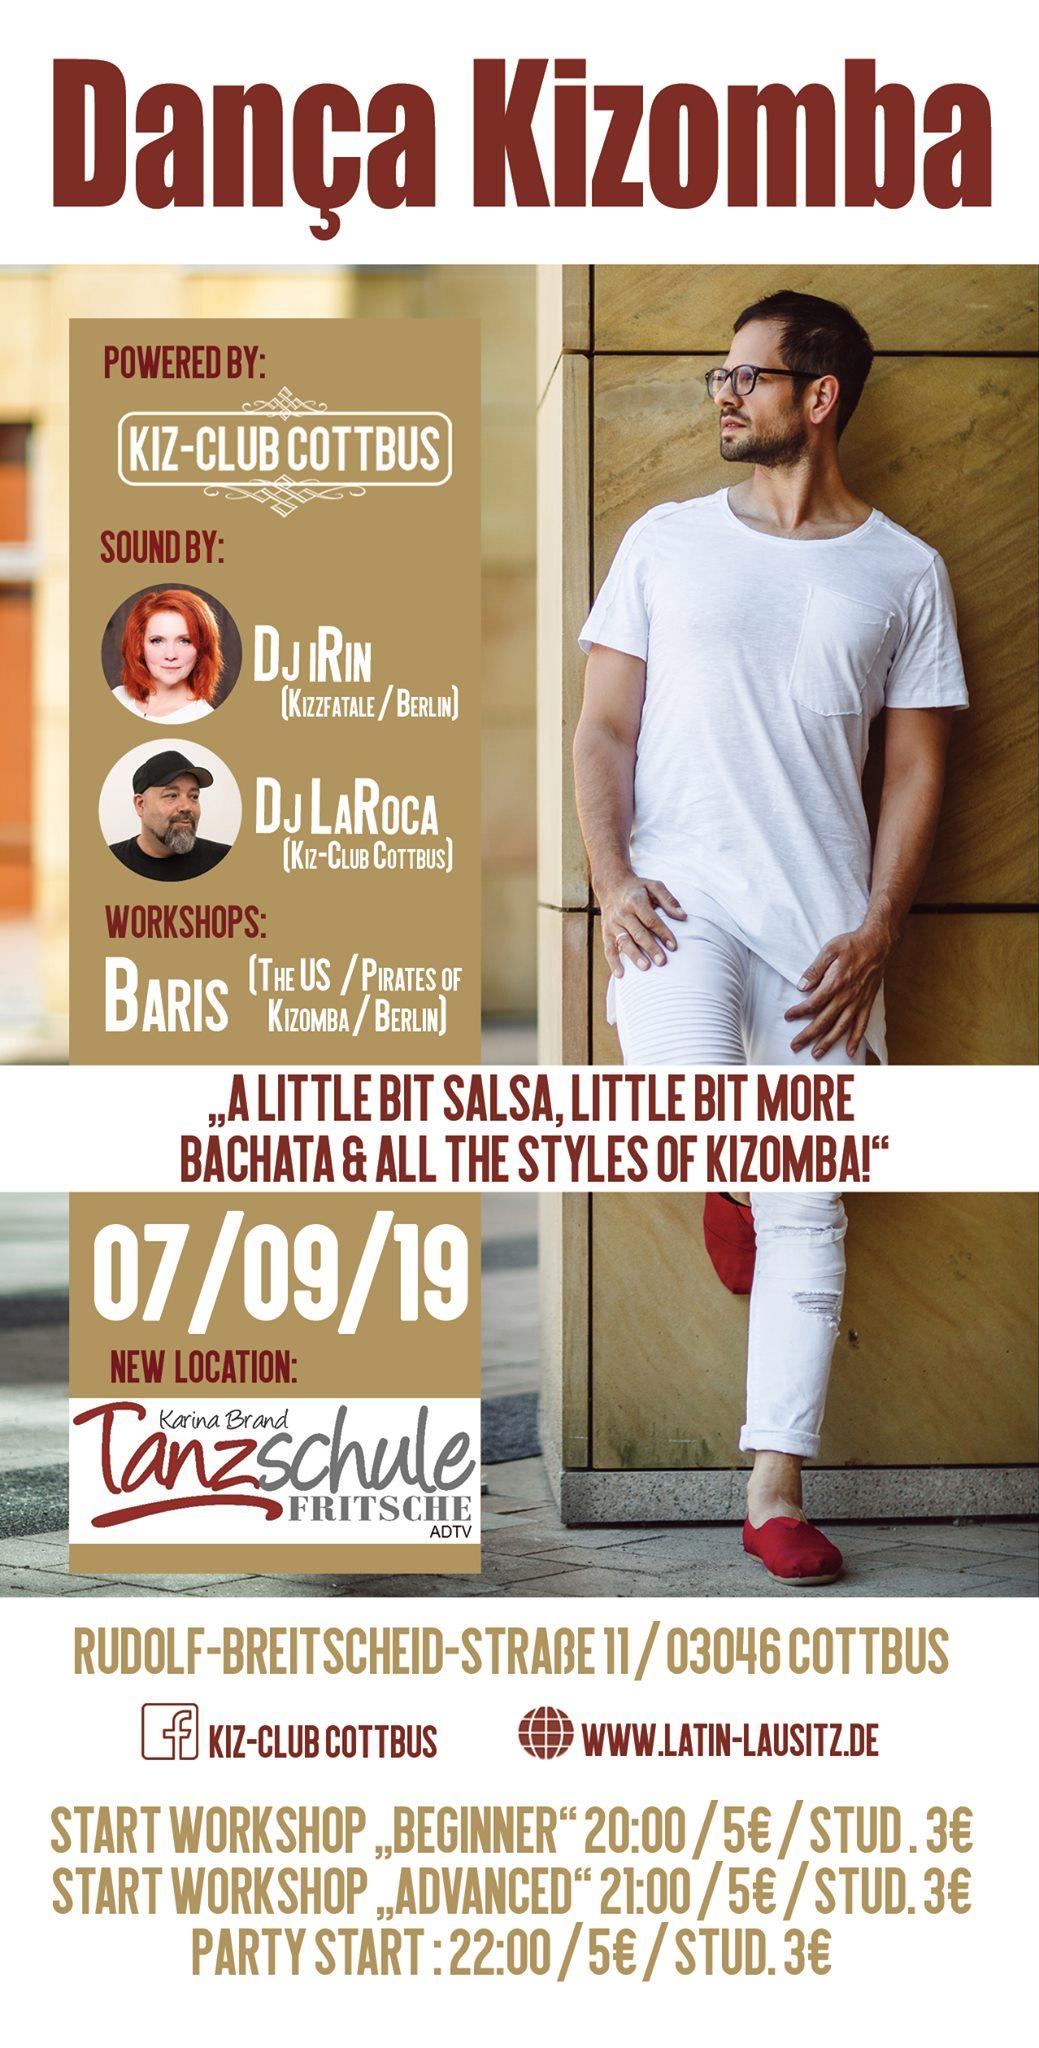 Danca Kizomba 2019-09-07 Cottbus Tanzschule Fritsche Flyer